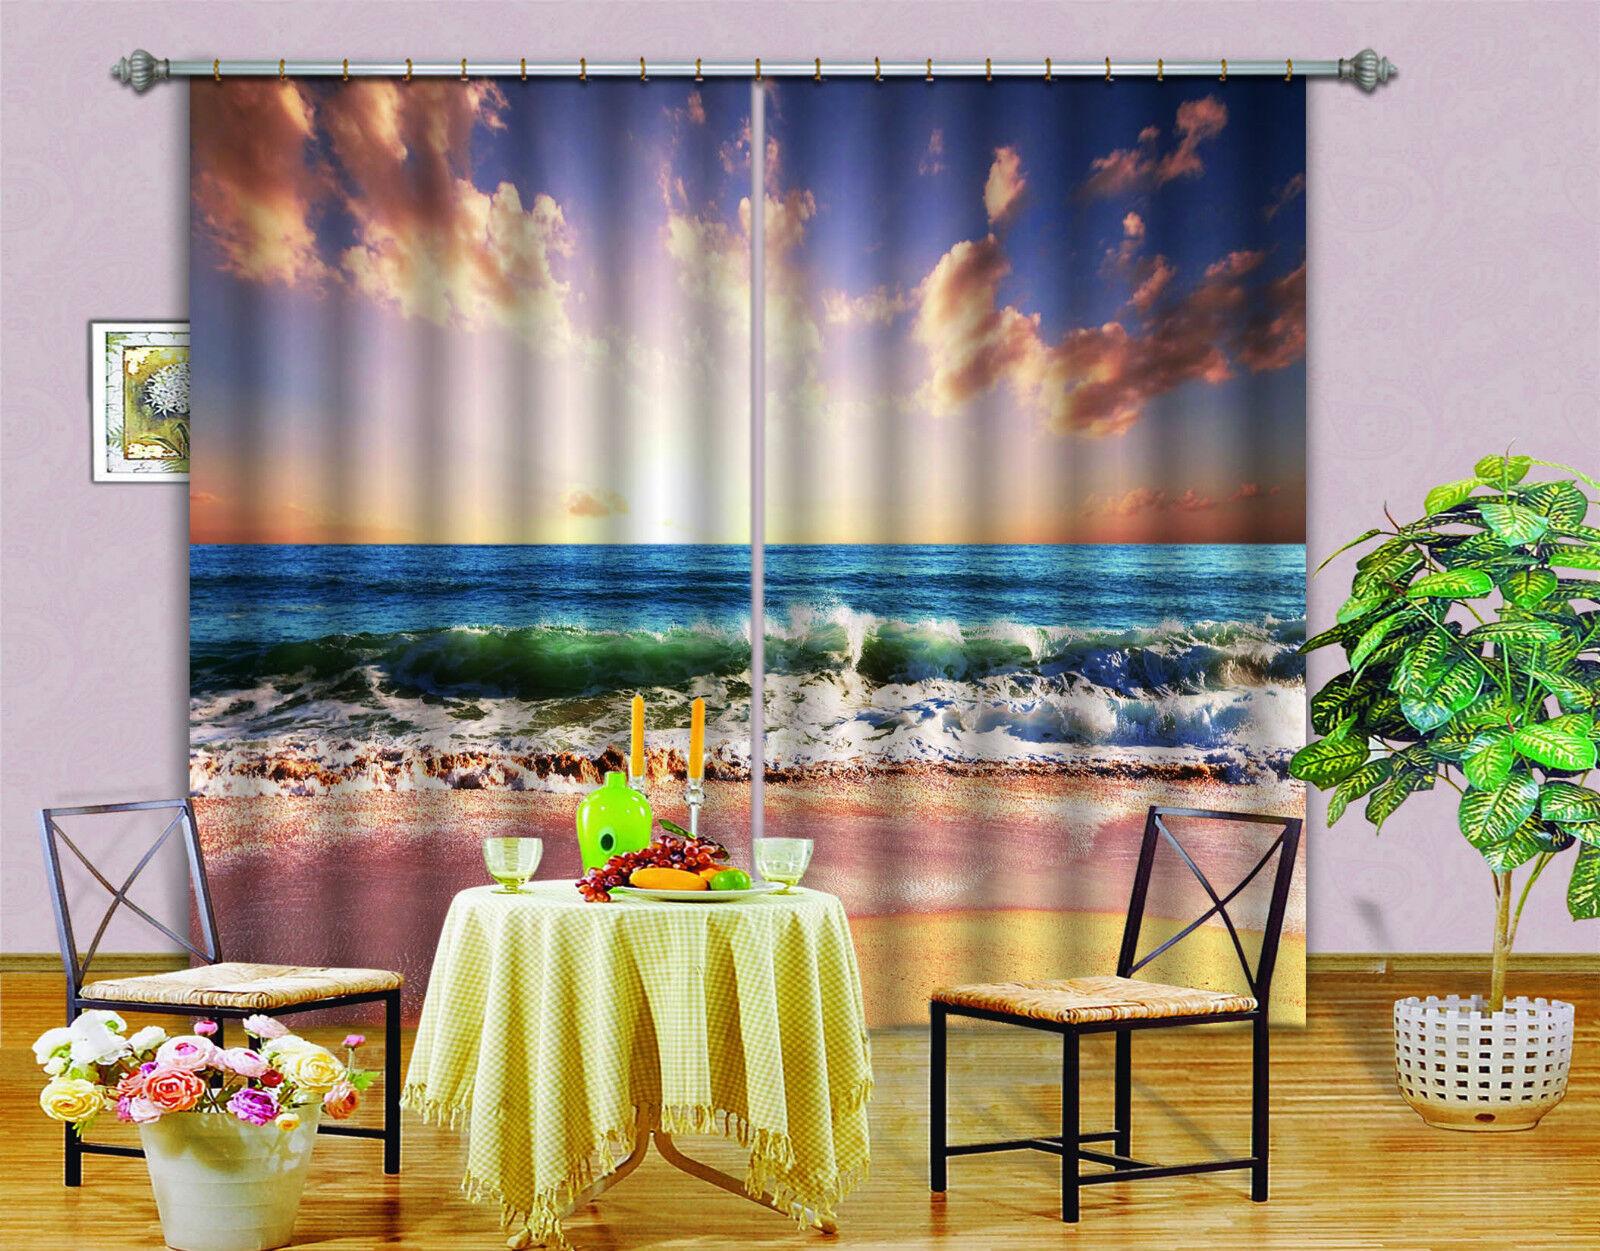 3d mar ola 538 bloqueo foto cortina cortina de impresión sustancia cortinas de ventana